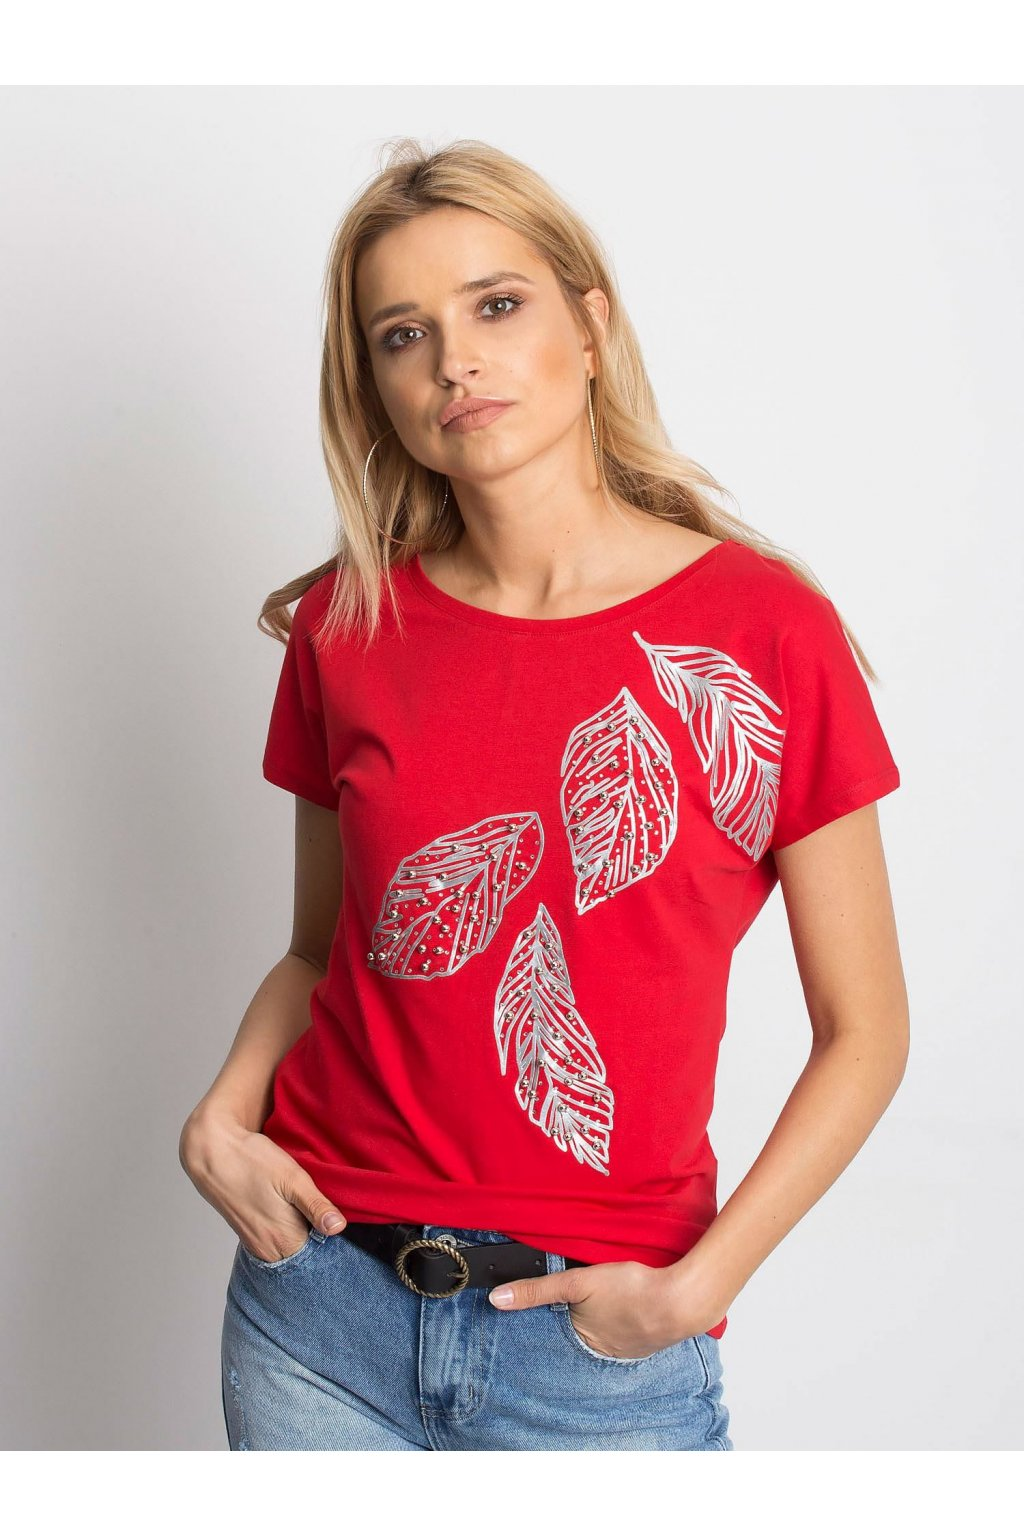 Tričko t-shirt kód YP-BZ-ATB0057.08